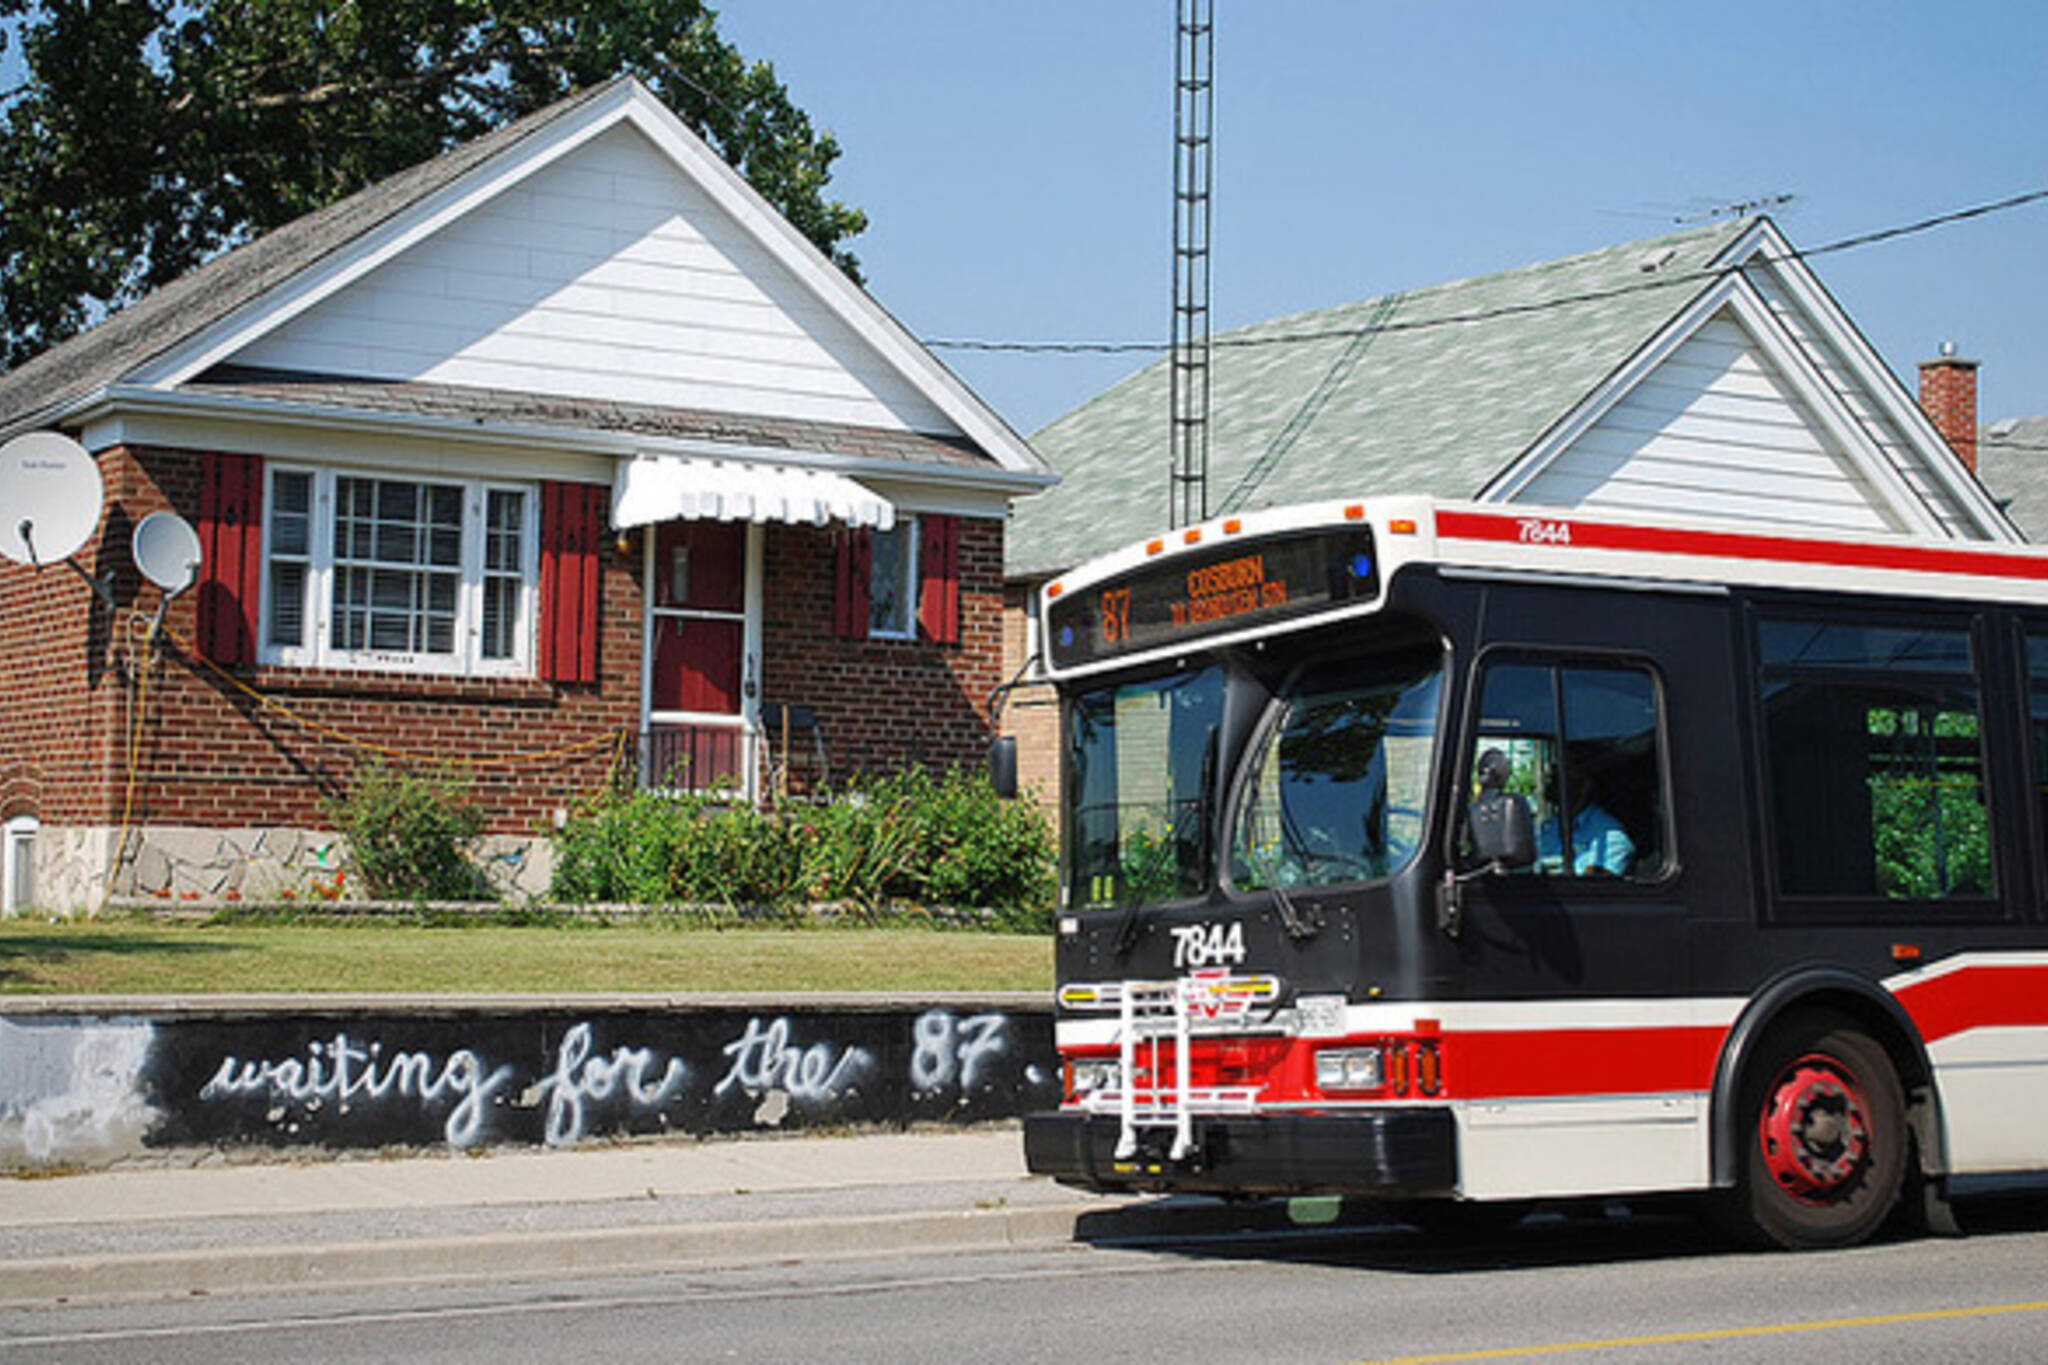 TTC GPS Bus arrival info